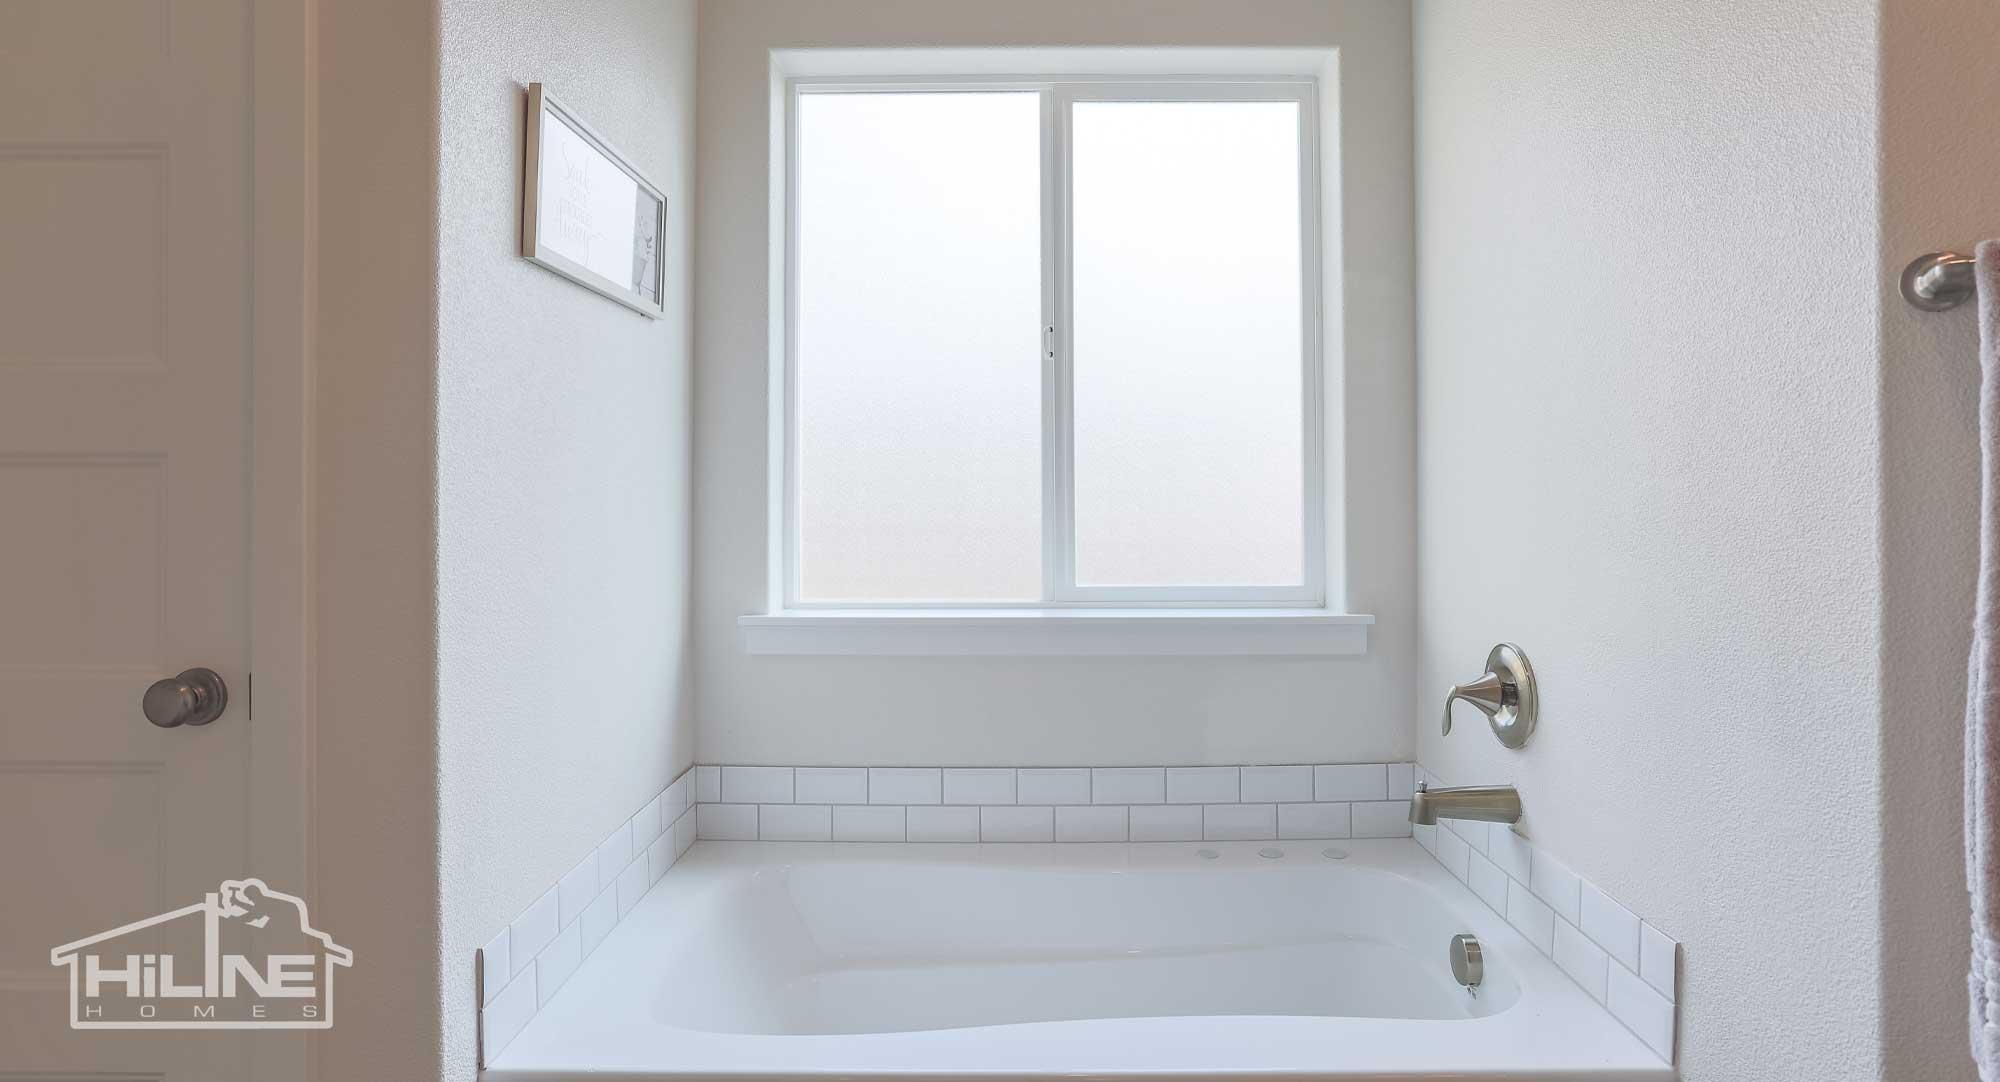 Image of HiLine Homes of Meridian Bath Tub